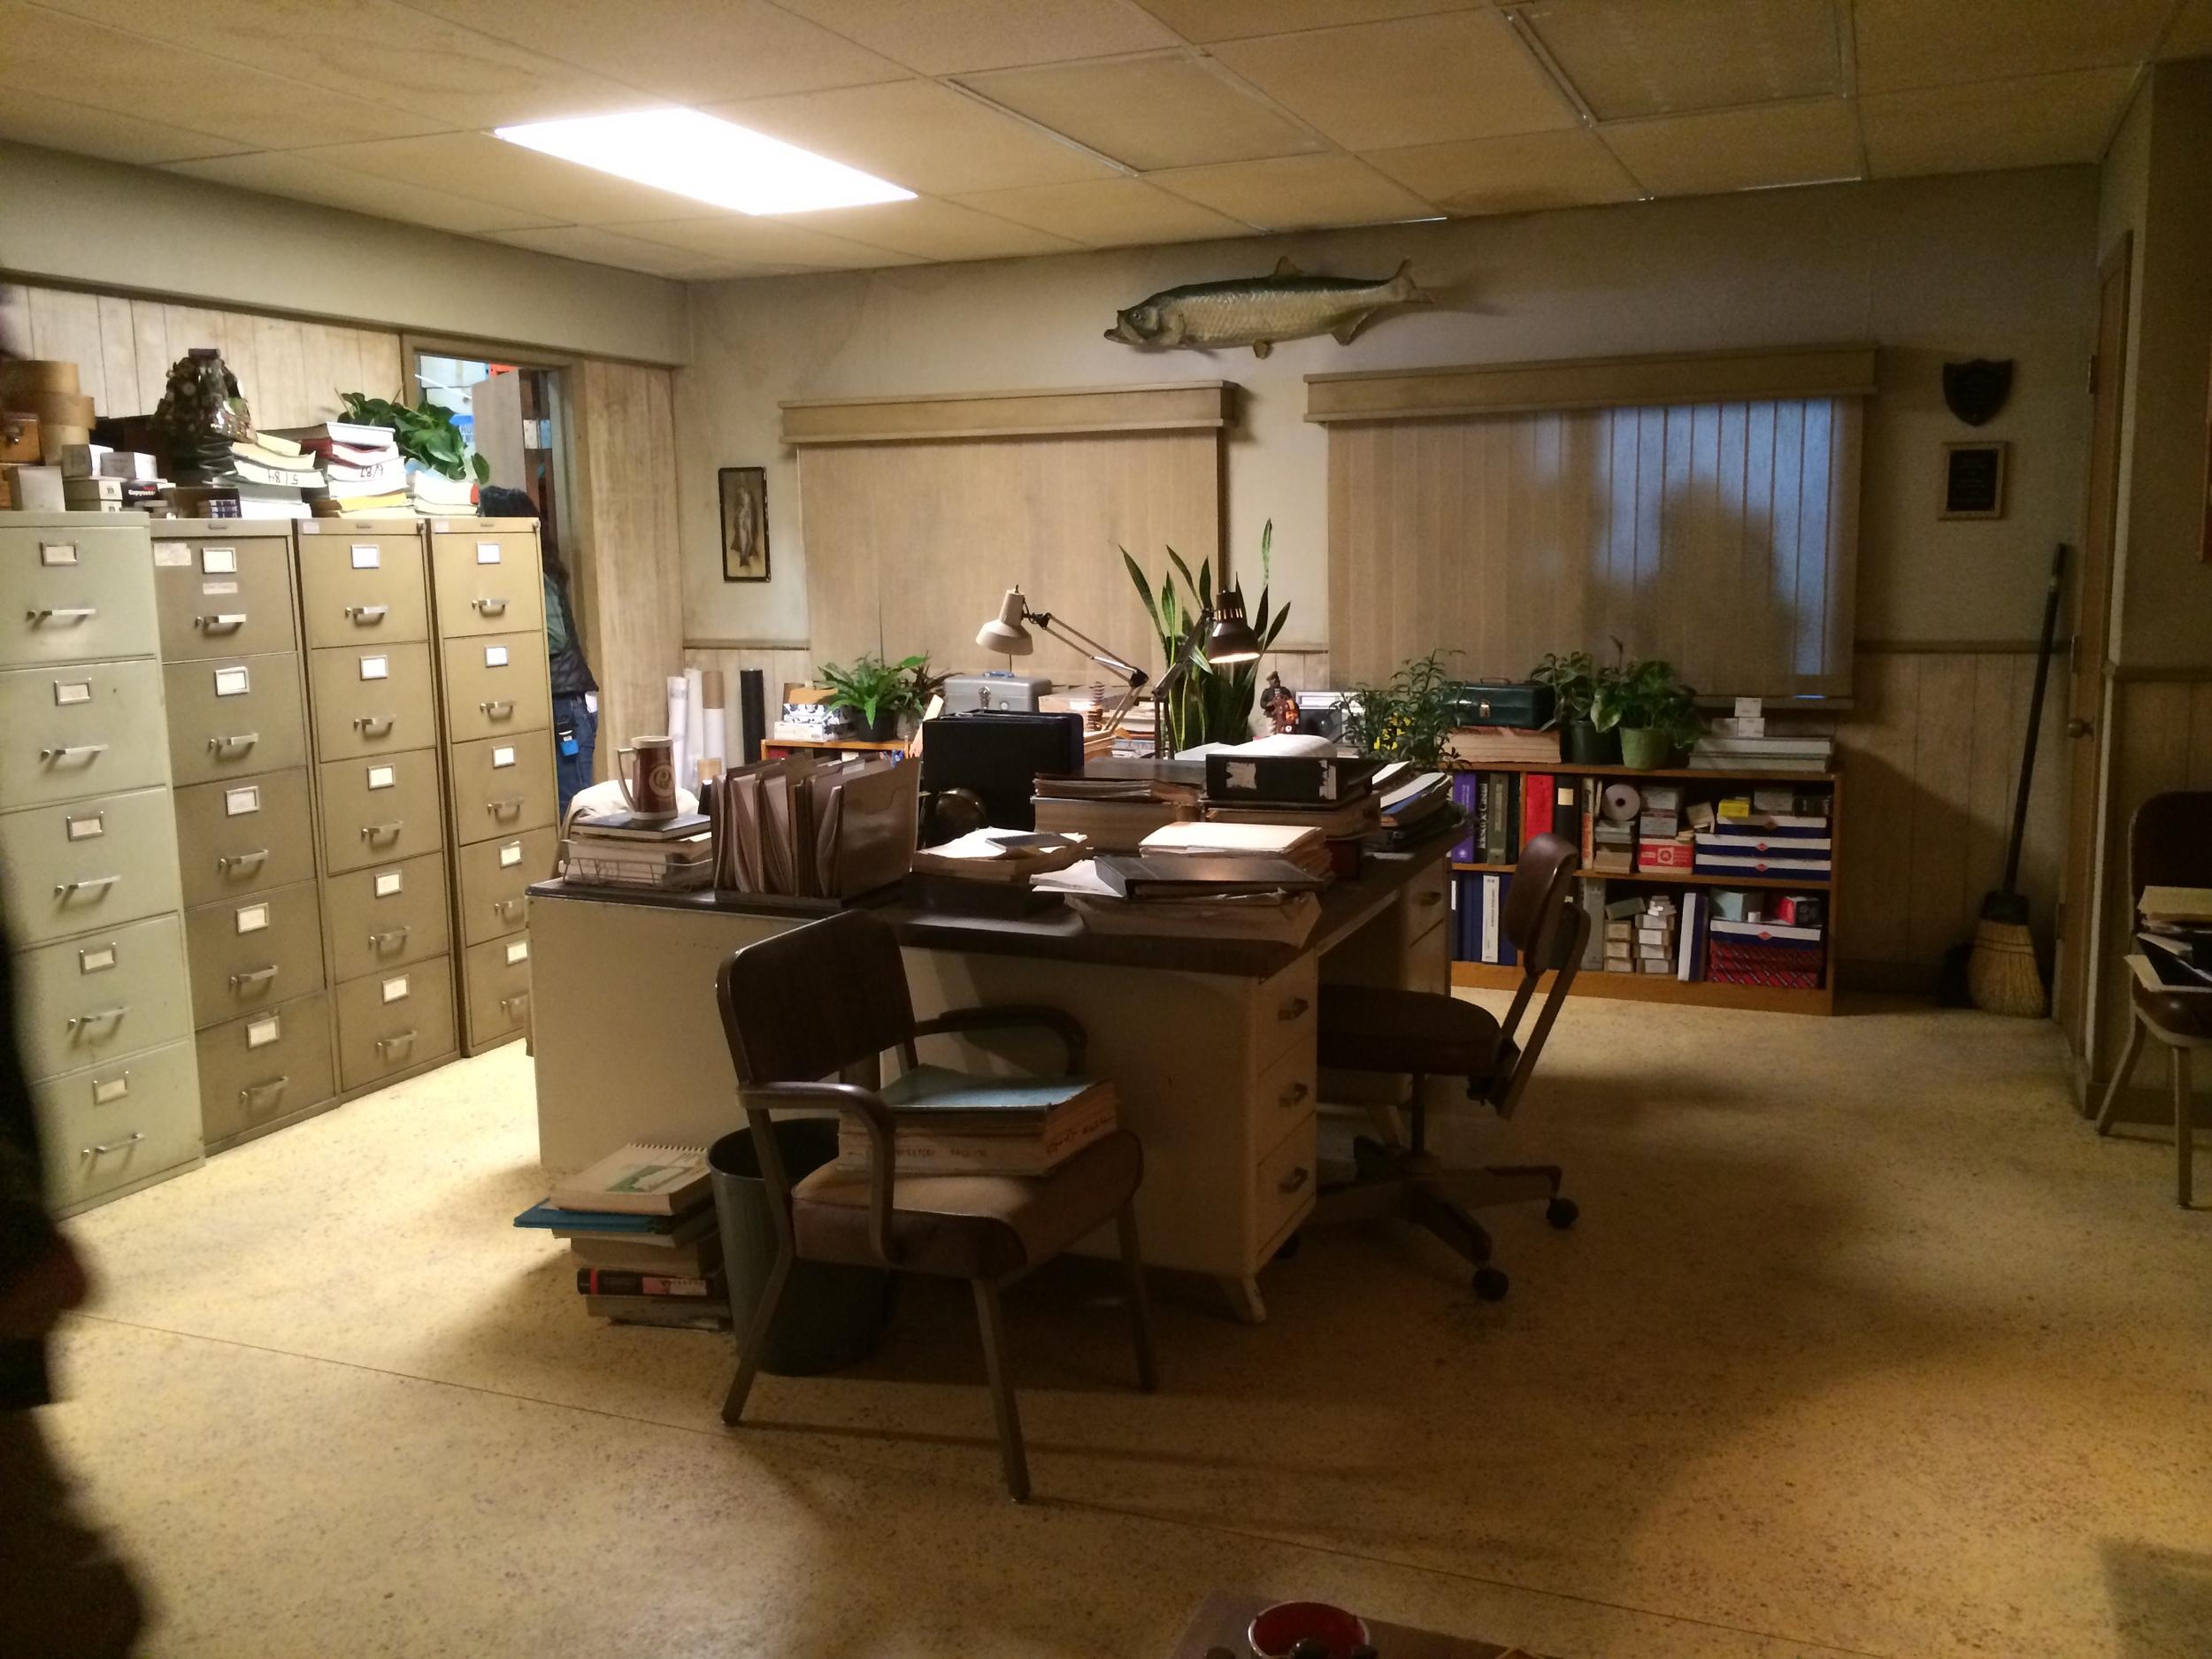 53b machine shop office 3.JPG